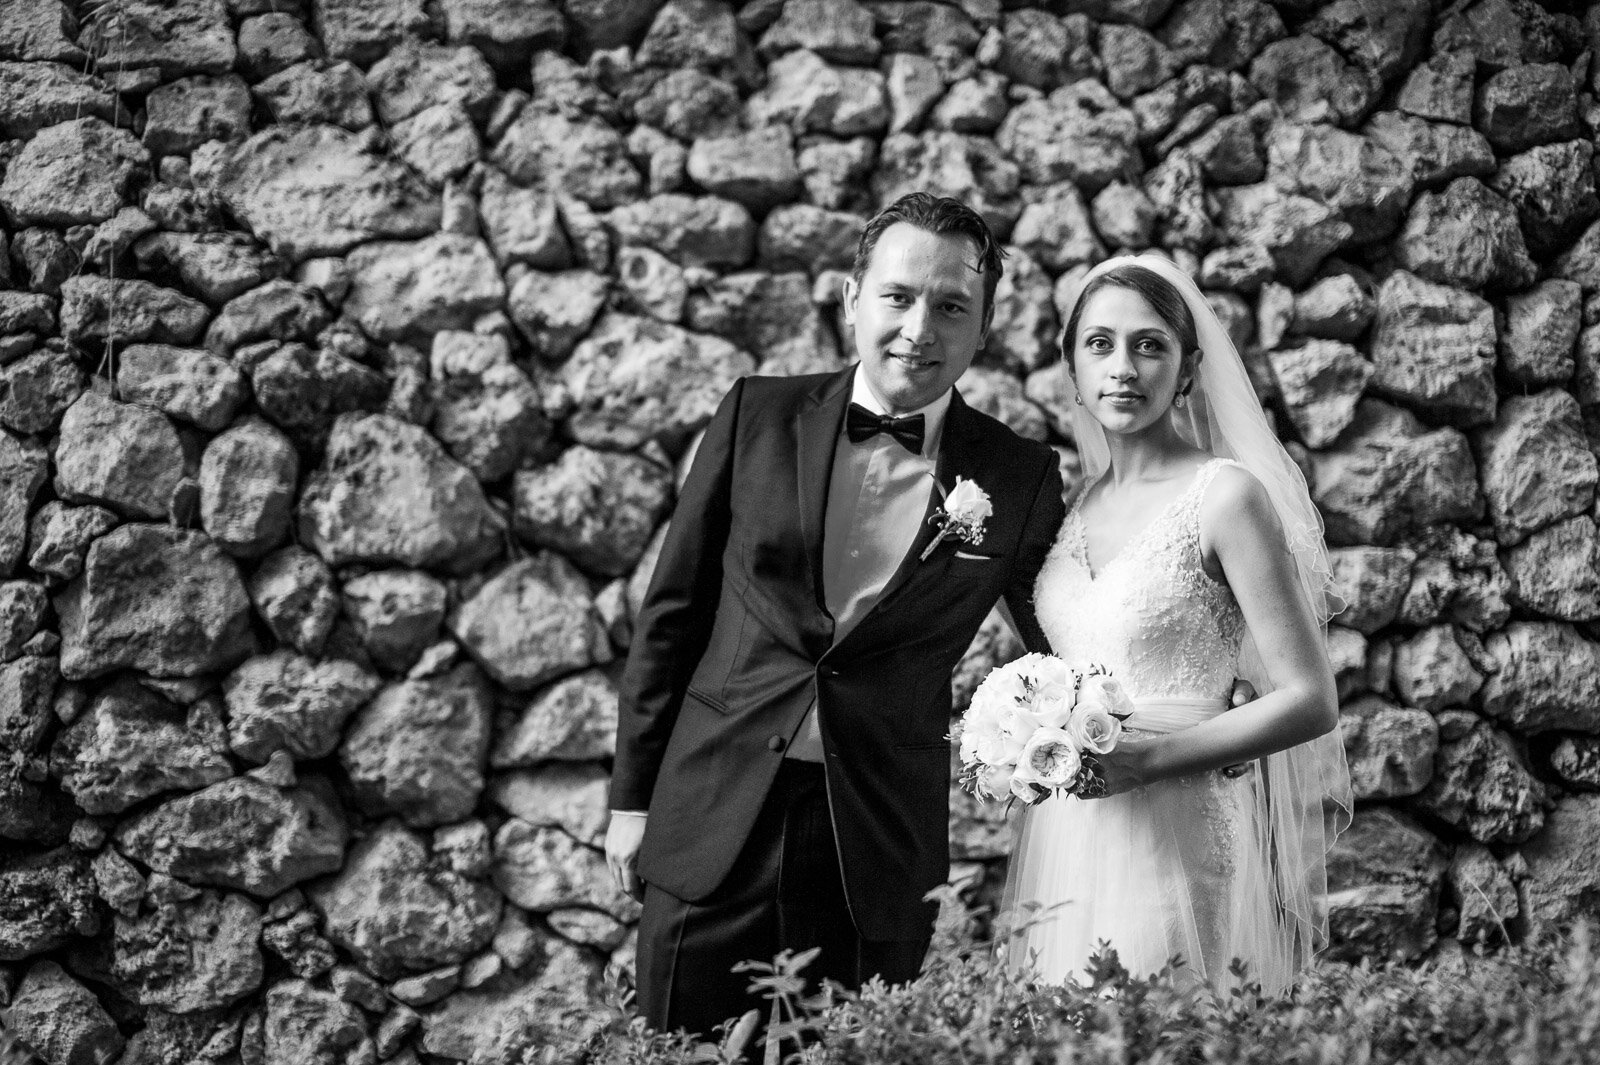 Russian Wedding in Villa Cimbrone Costiera Amalfitana 24.jpg